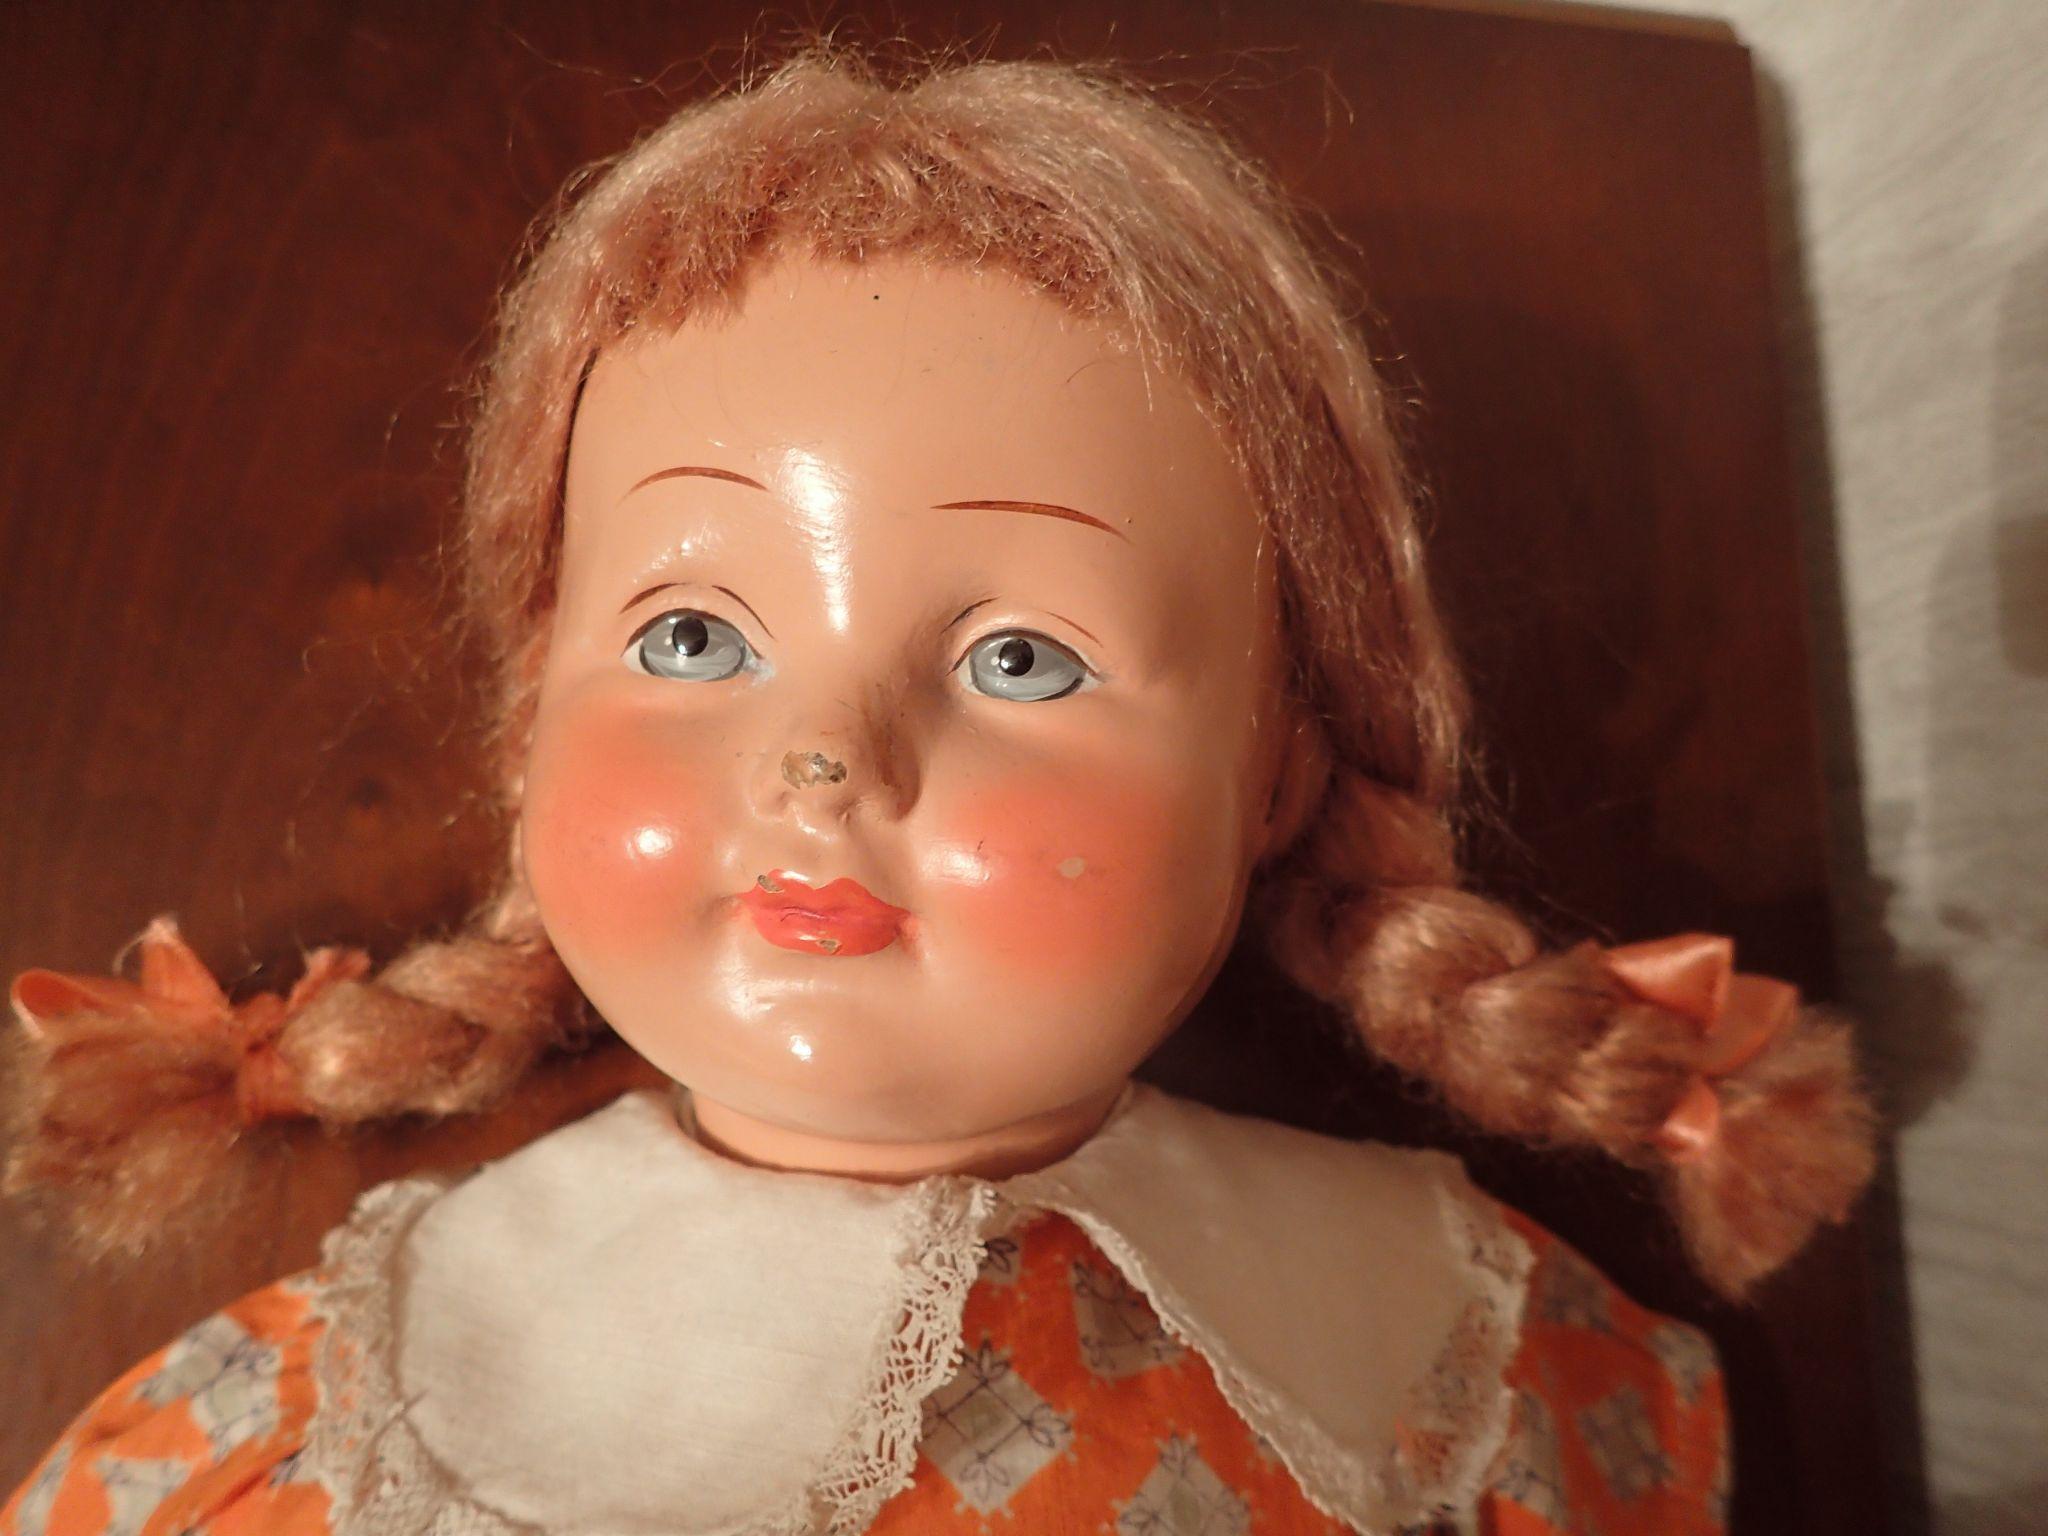 тоже ремонт опилочной куклы по шагово с фото тихо